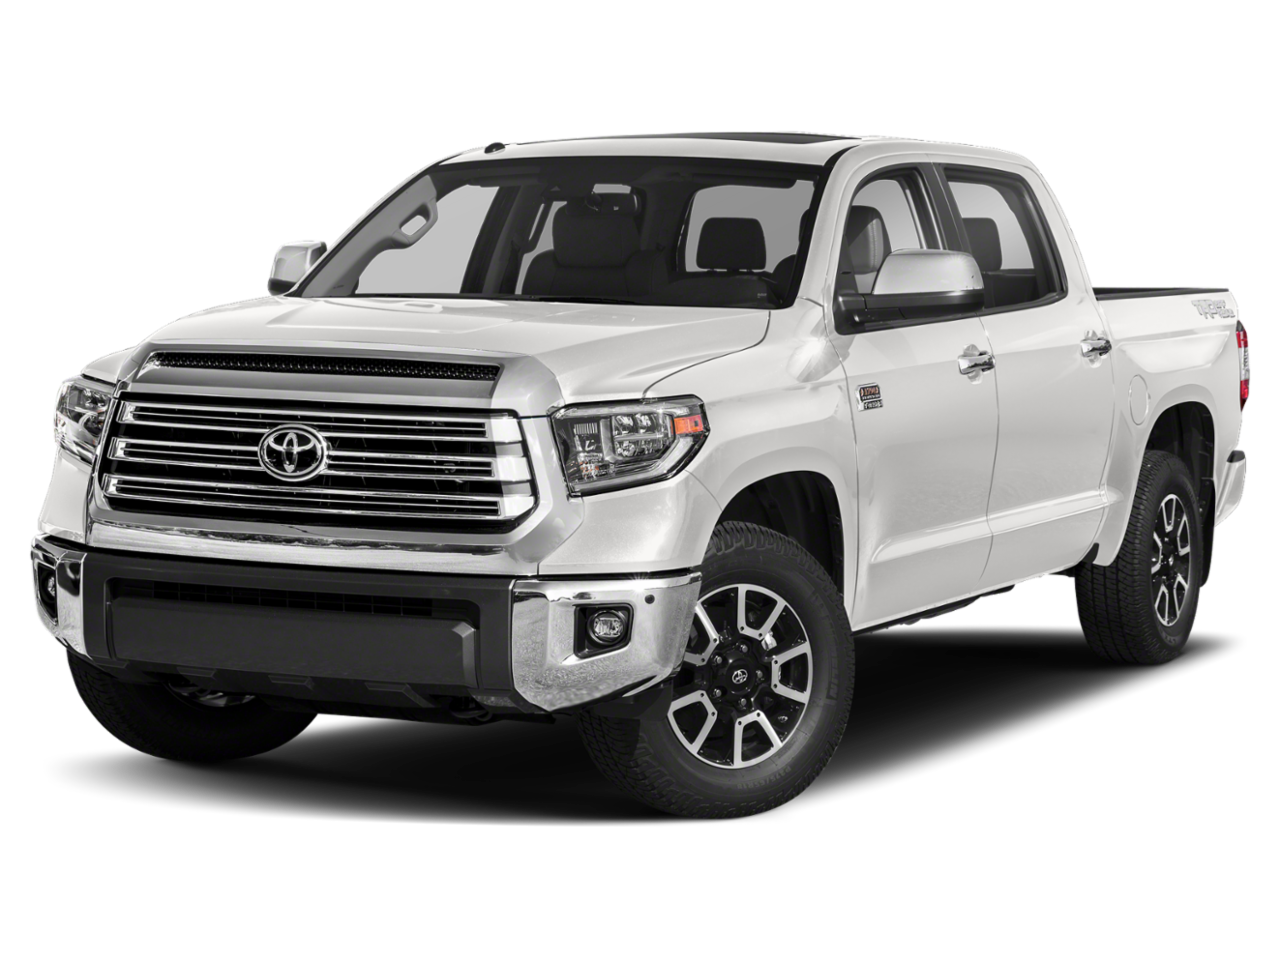 Toyota 2021 Tundra 2WD 1794 Edition